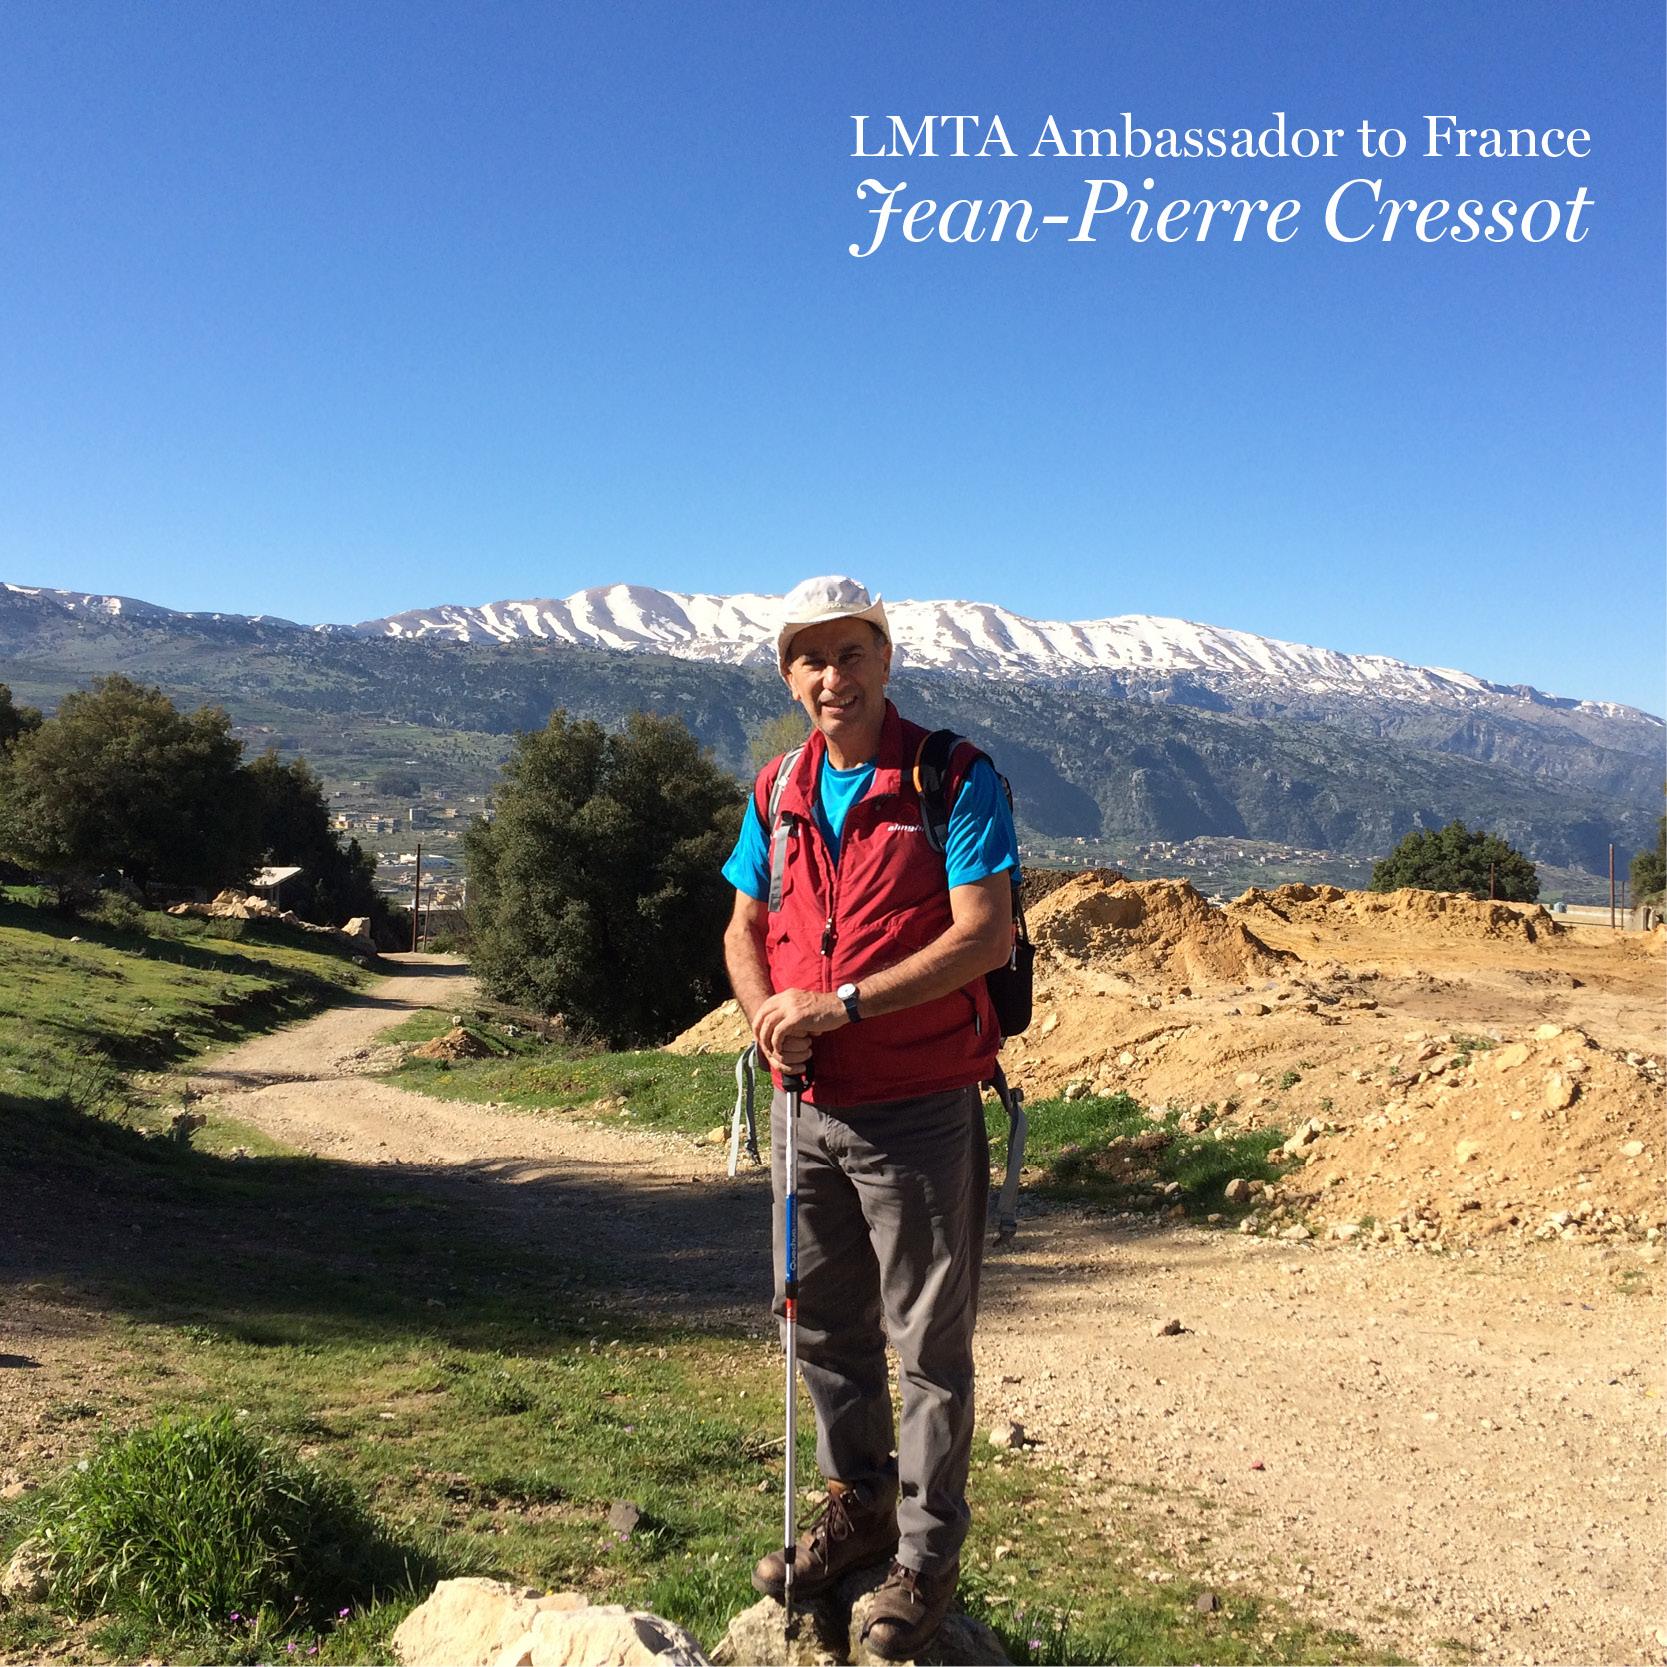 Jean Pierre Cressot, LMTA